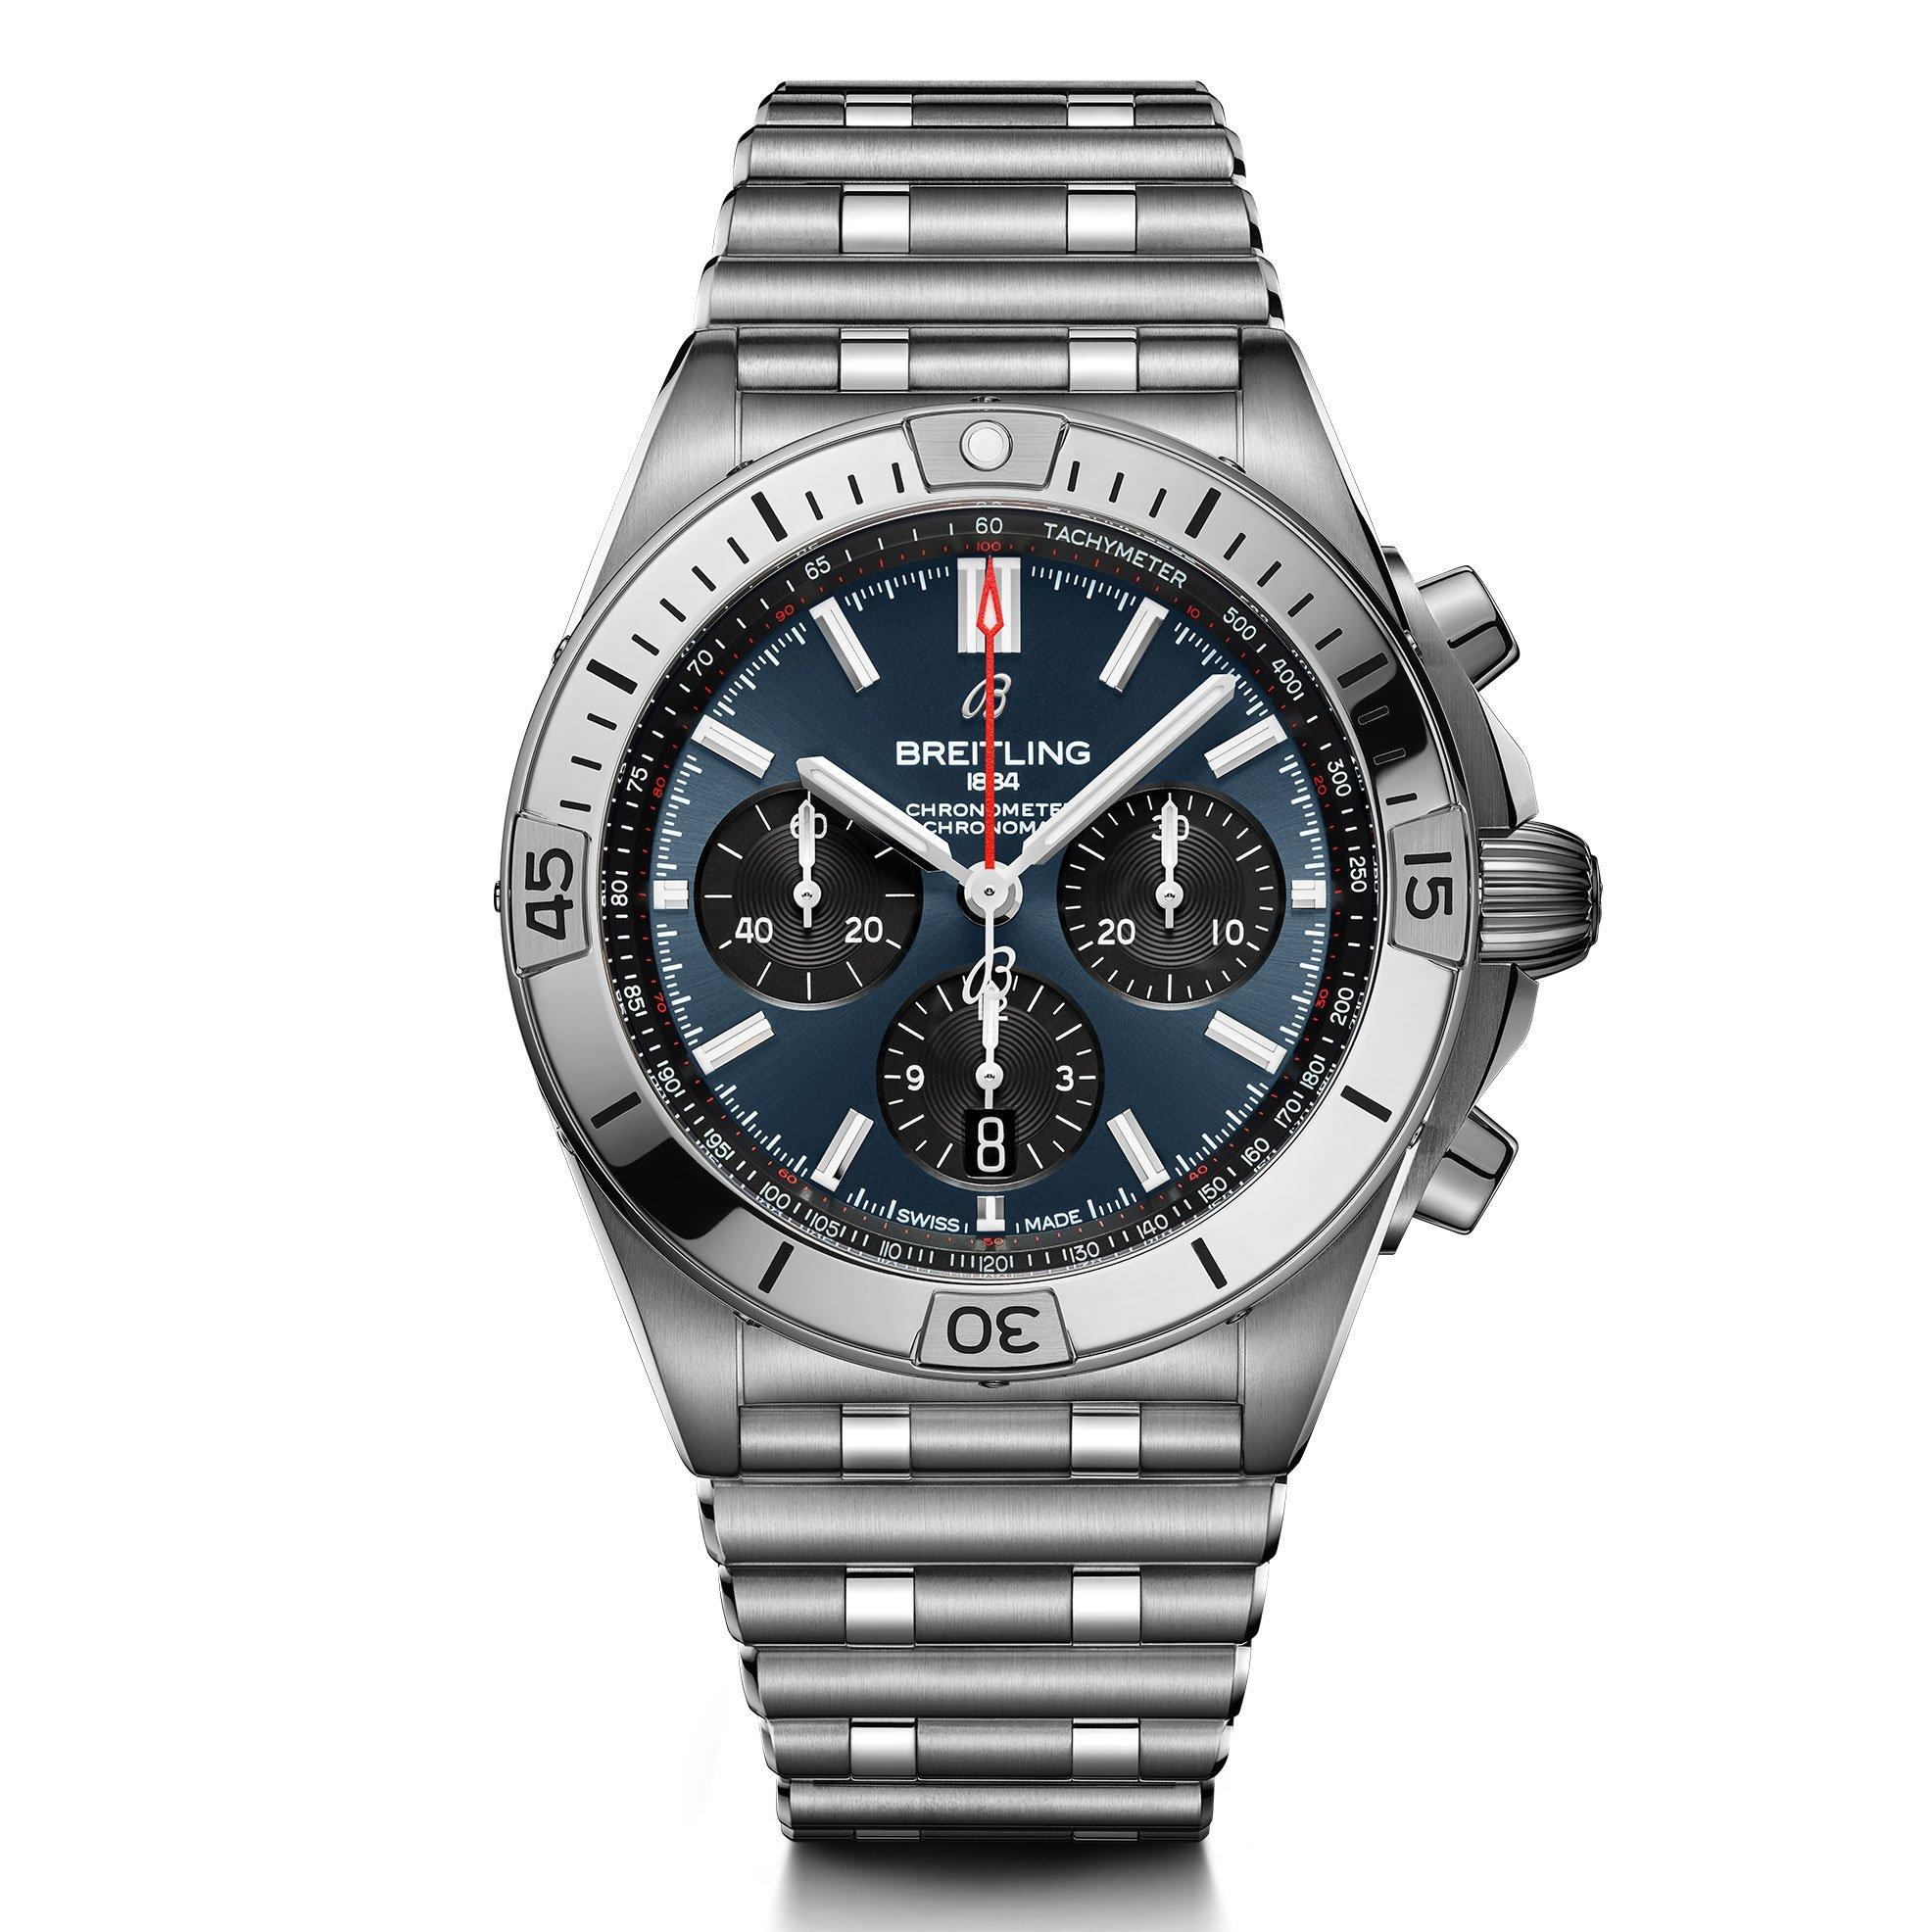 Breitling Chronomat B01 42 Chronograph Men's Watch